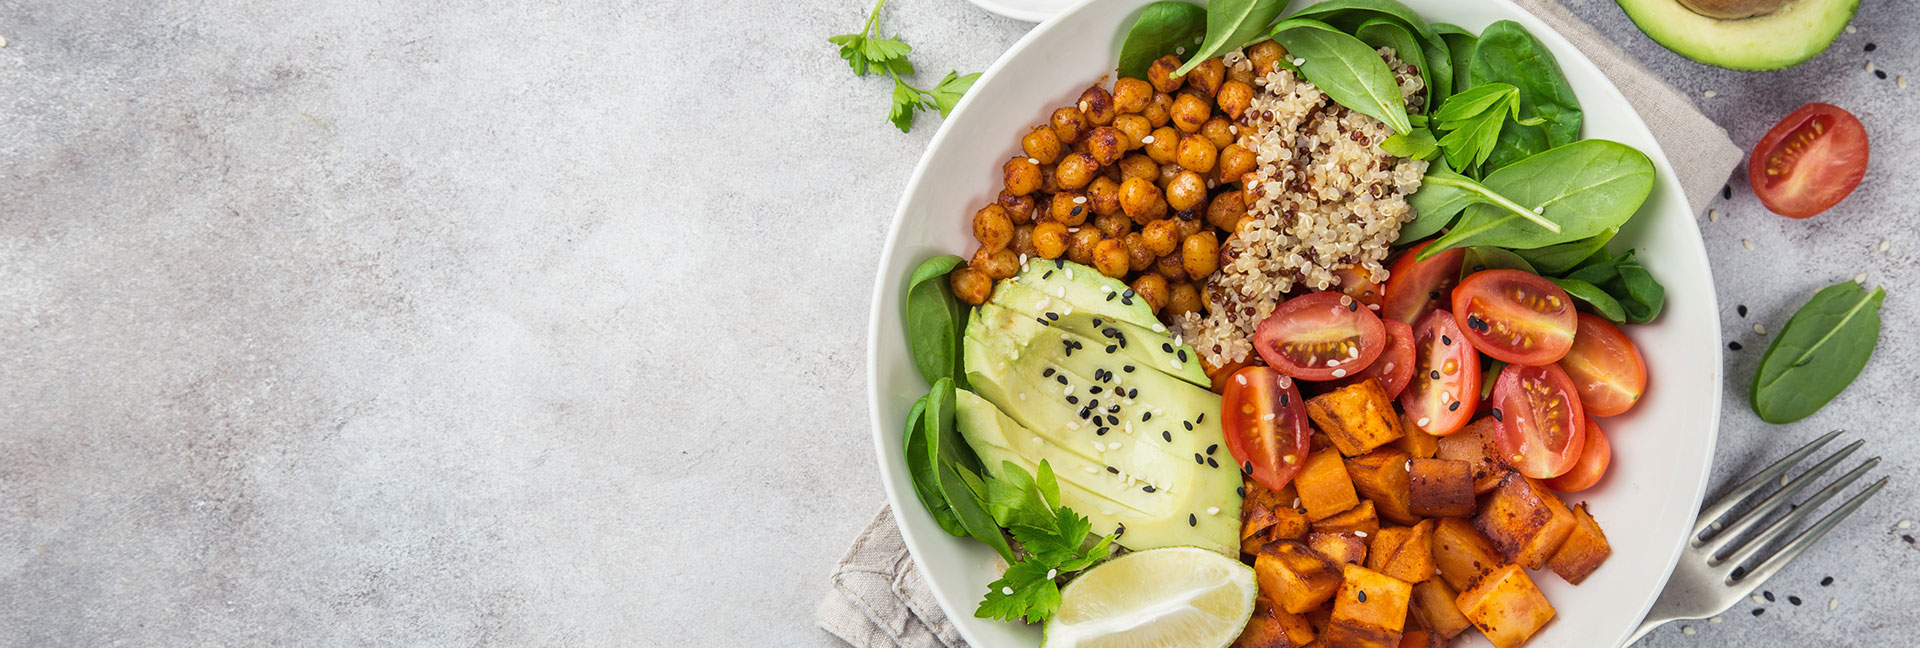 A bowl of vegetarian food